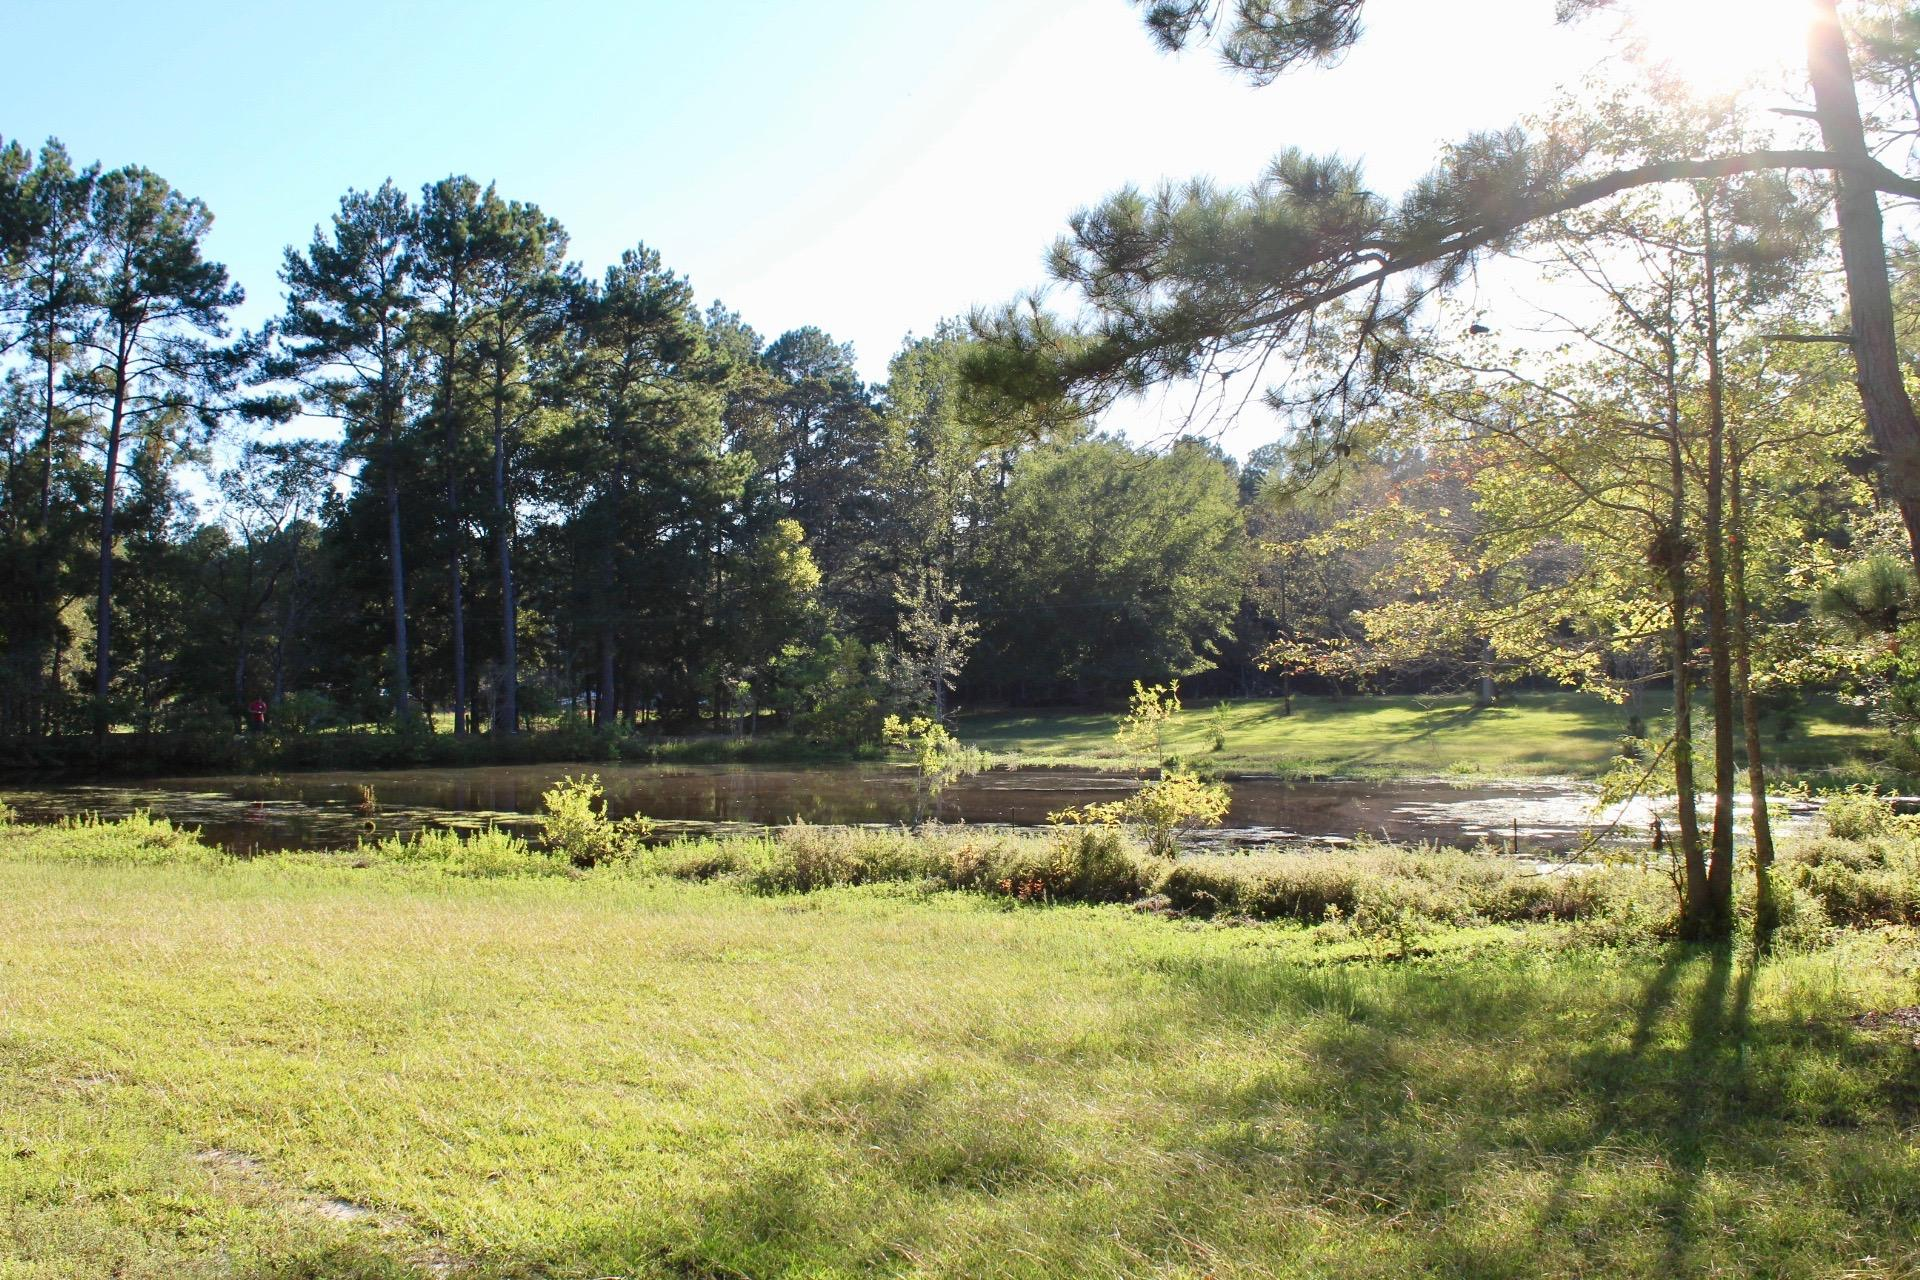 Leesville home for sale, 3142/3130 Savage Forks Rd, Leesville LA - $149,900